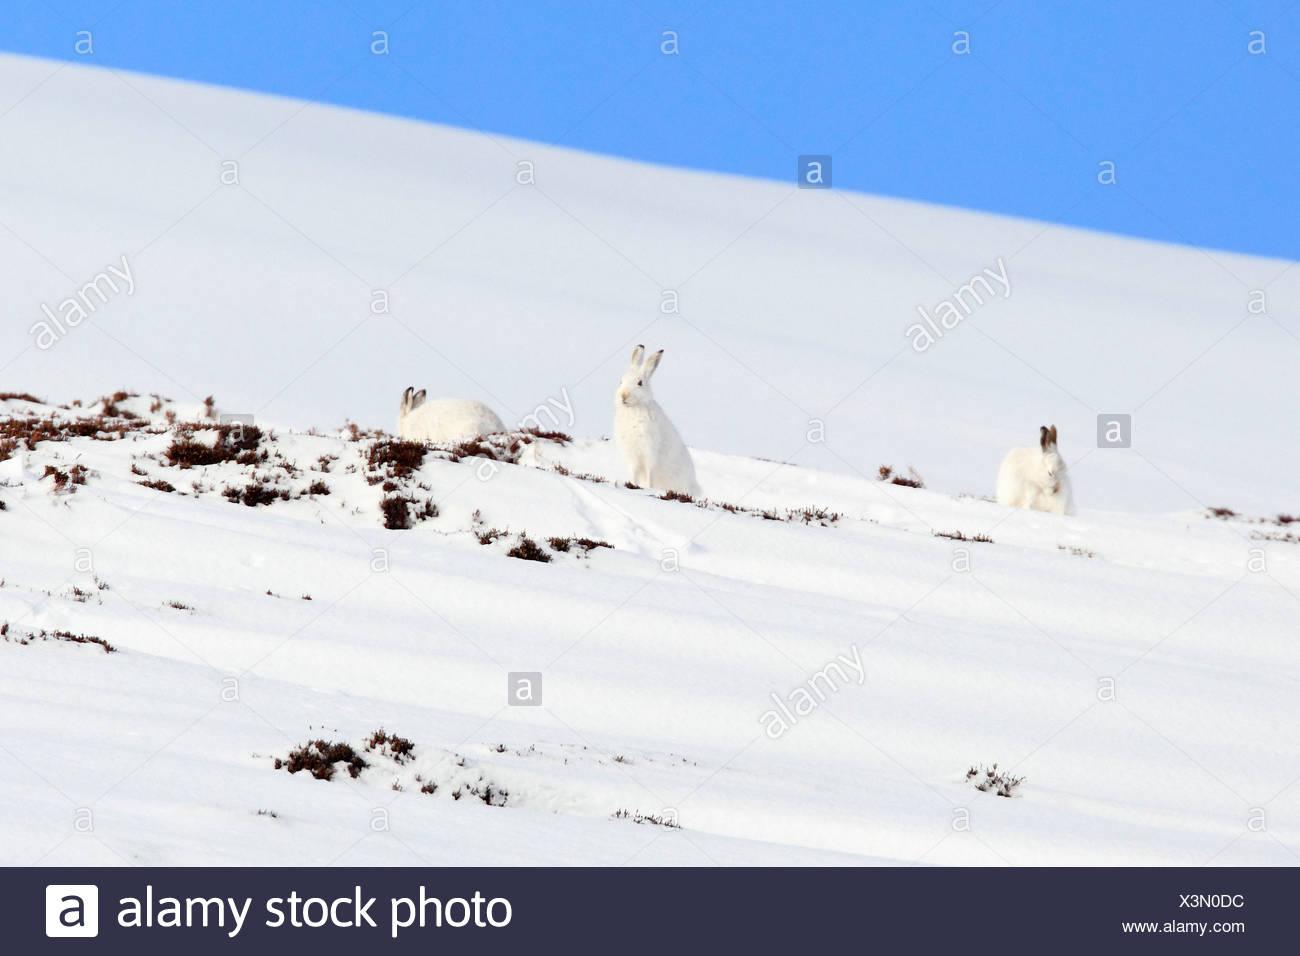 3, Alps, alpine, adapt, adjust, fauna, mountain, mountains, Cairngorms, ice, fauna, fur, cliff, mountains, hare, rabbit, highlan - Stock Image